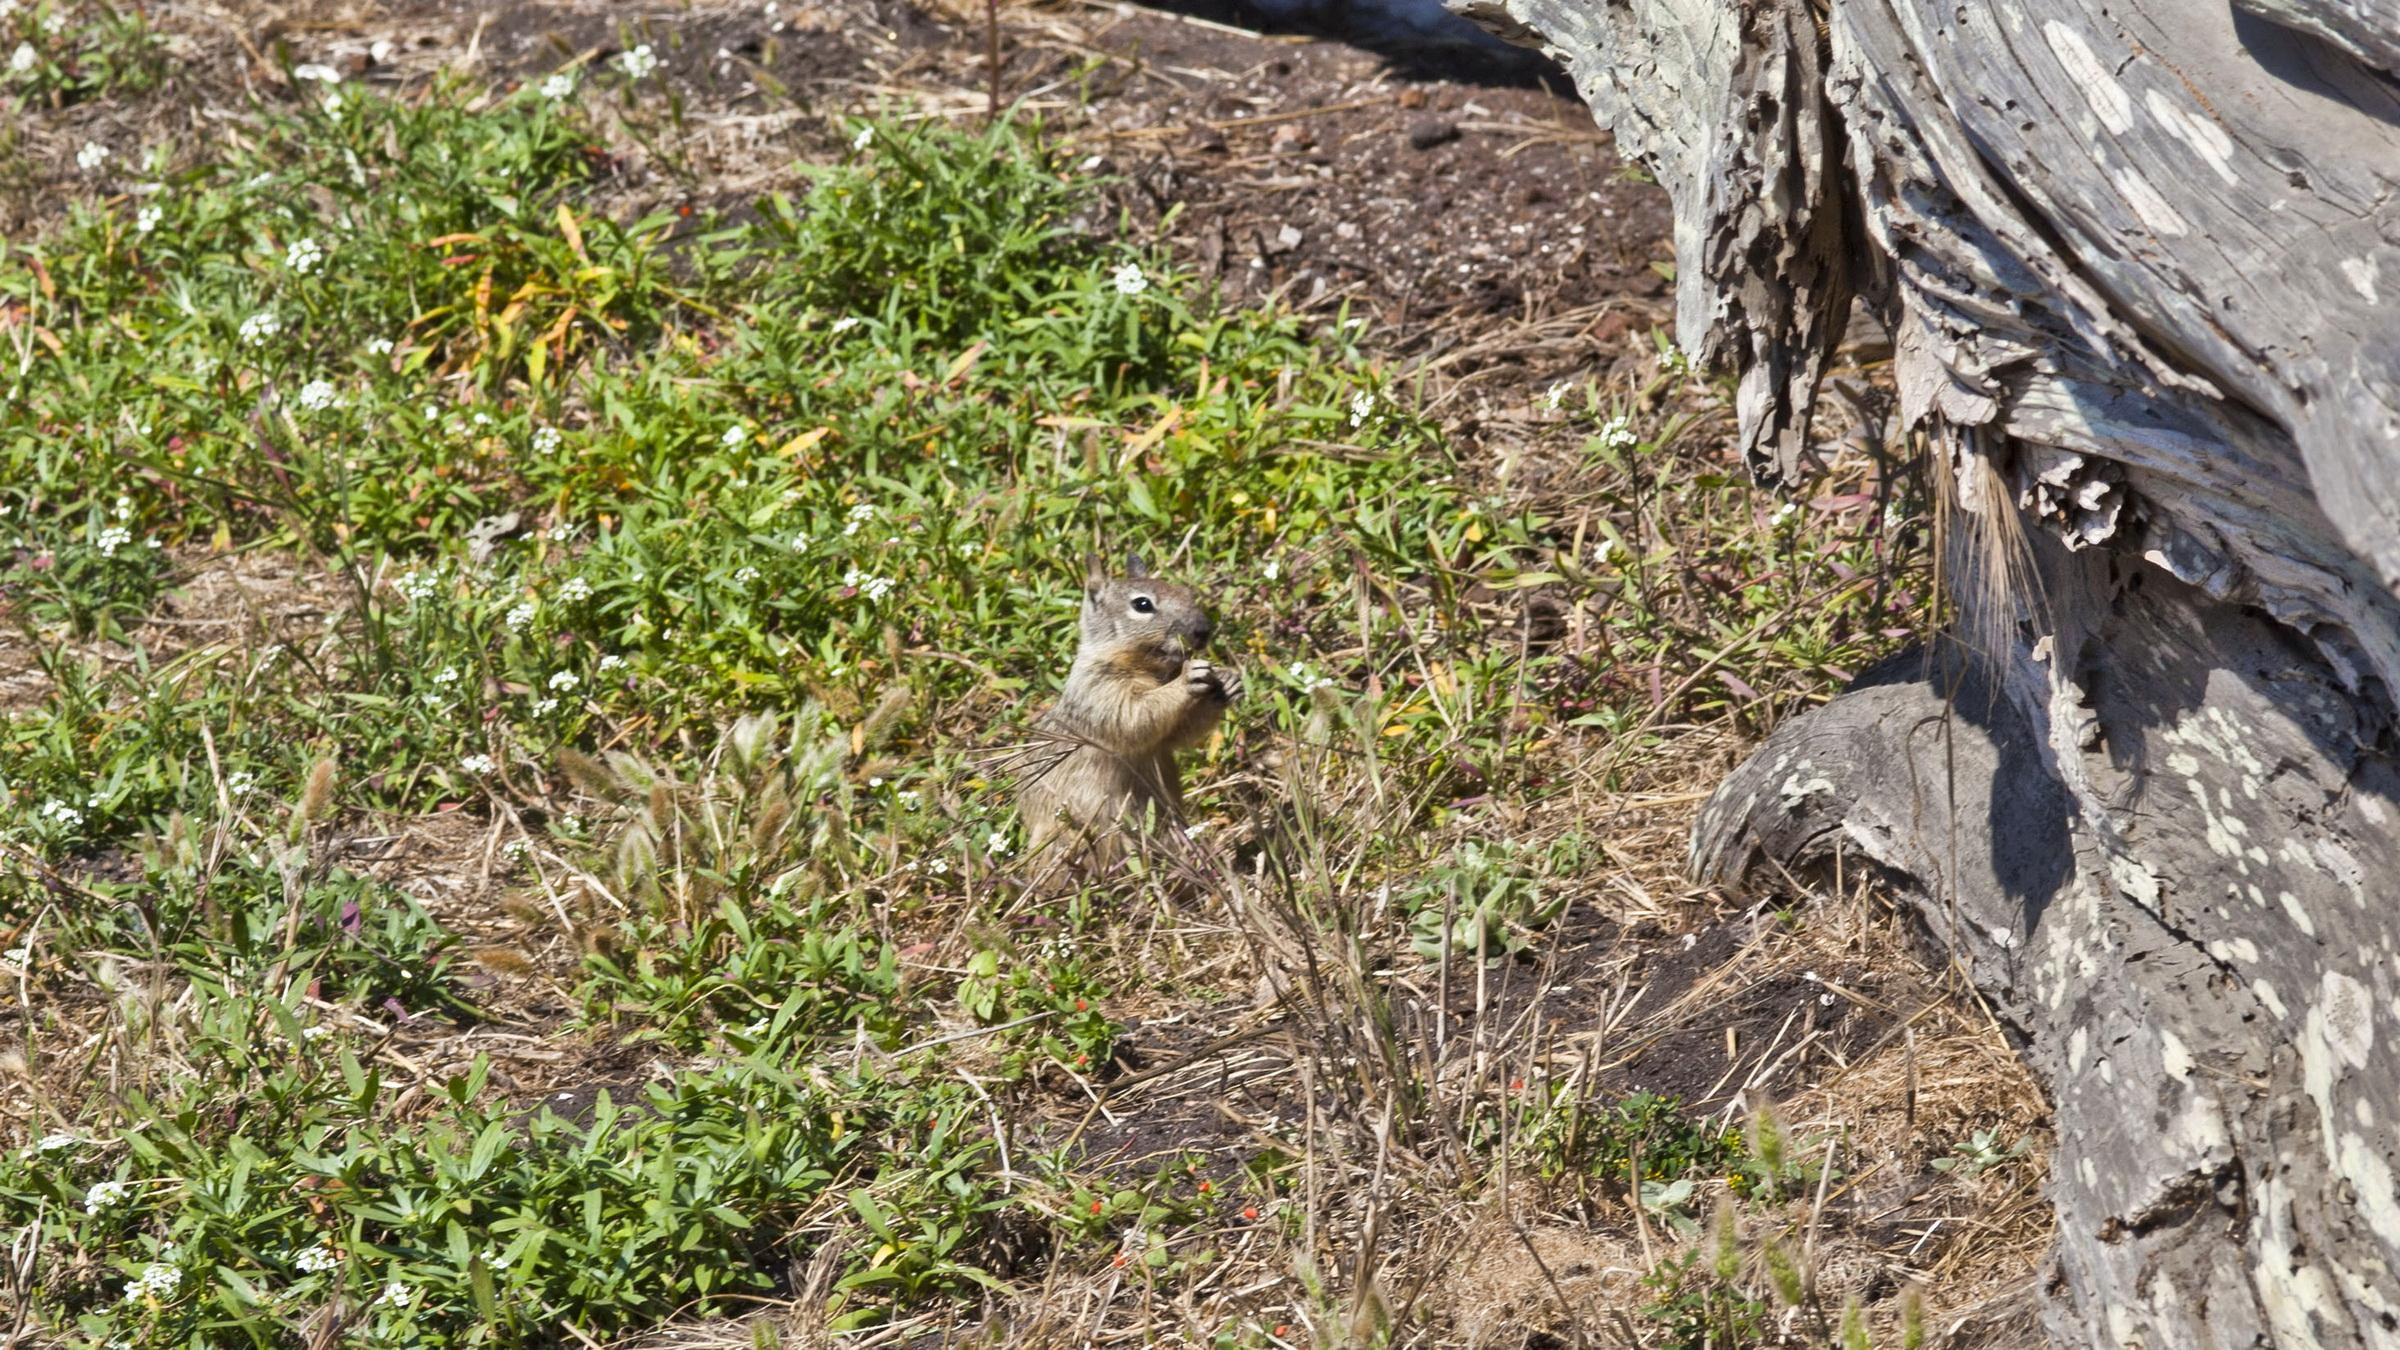 California ground squirrel Otospermophilus beecheyi 17 Mile Drive Monterey CA July 2011 05